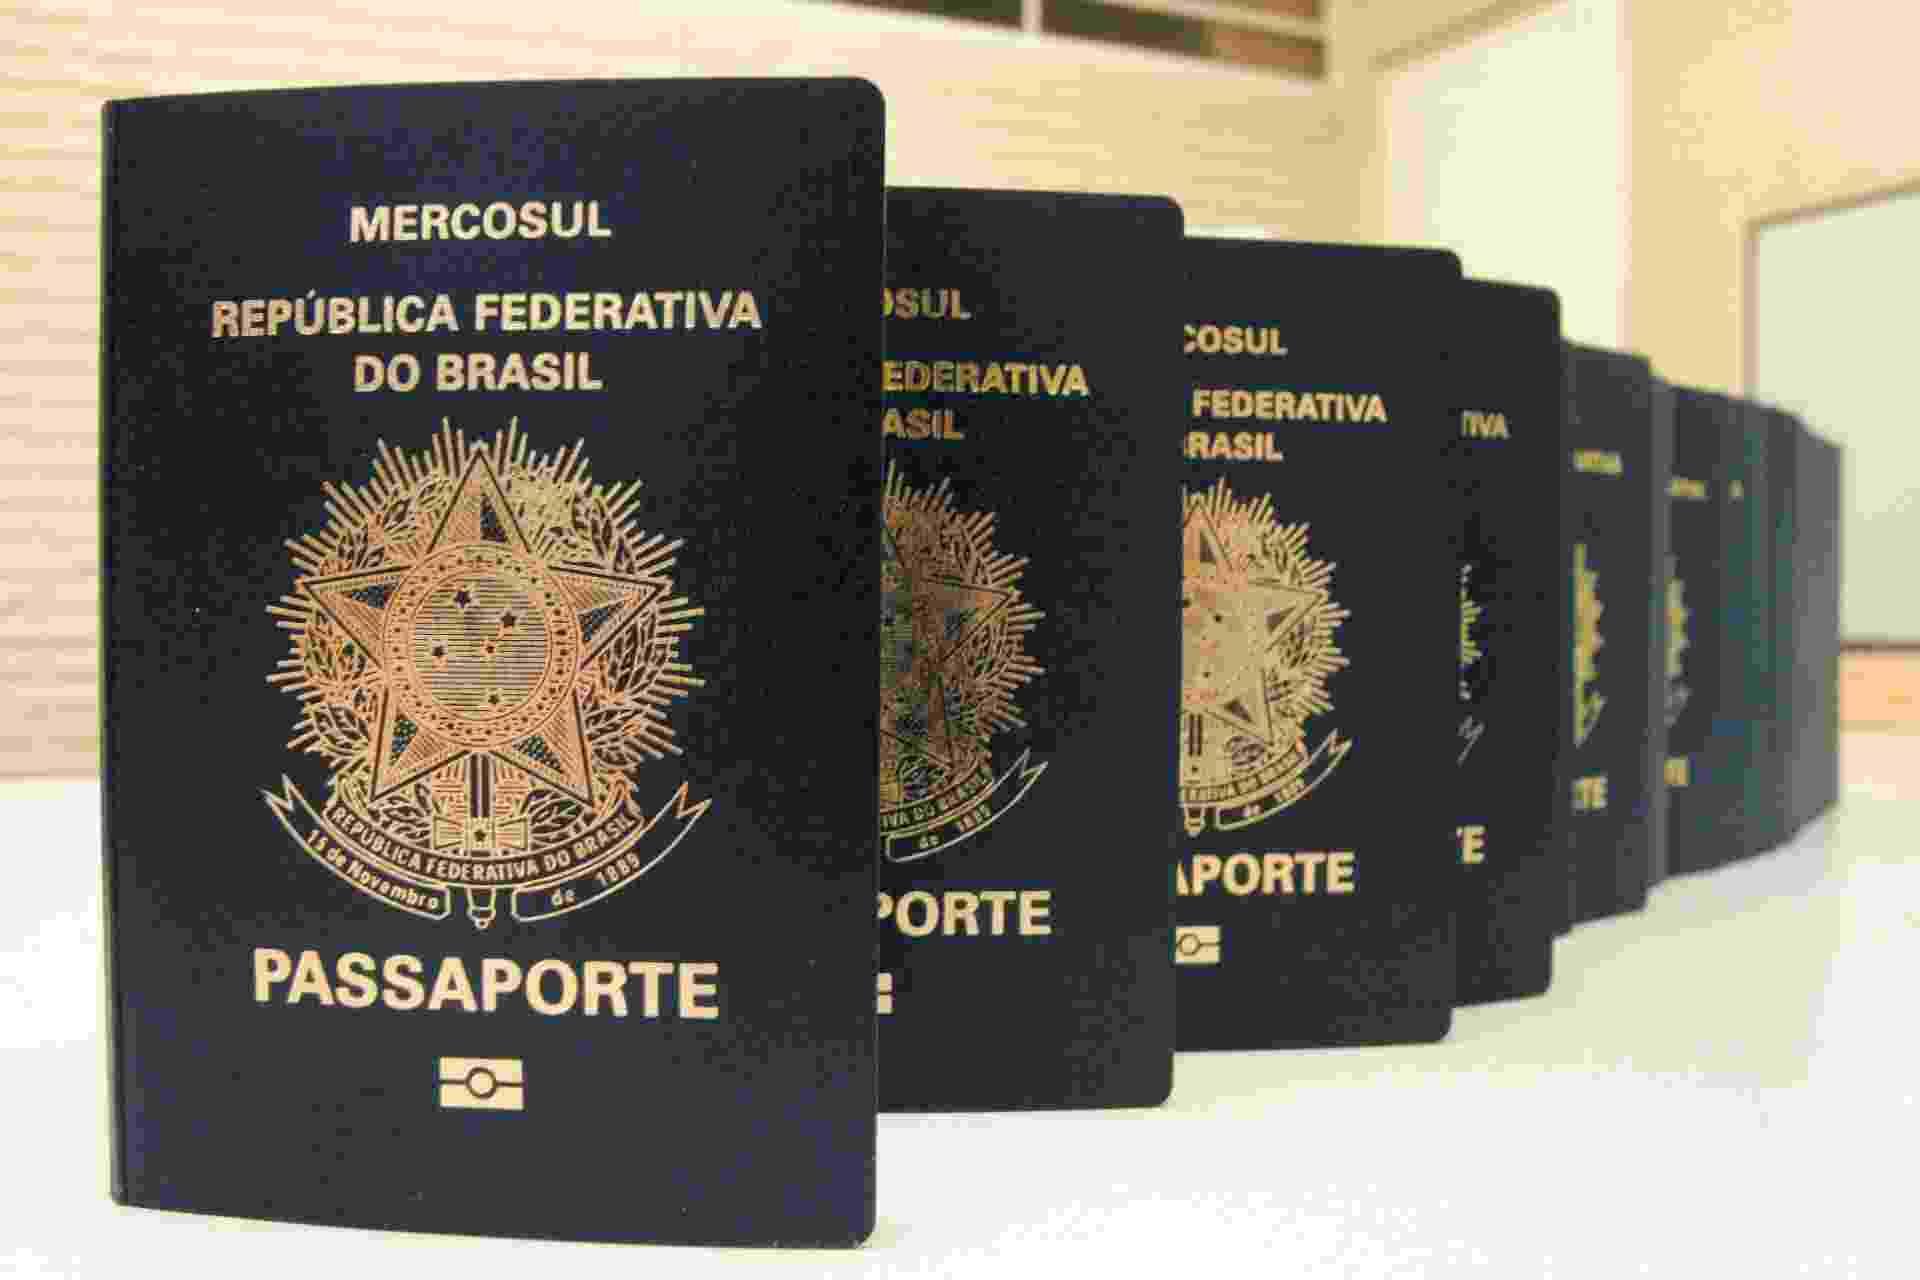 Passaporte - Marcia Ribeiro/ Folhapress